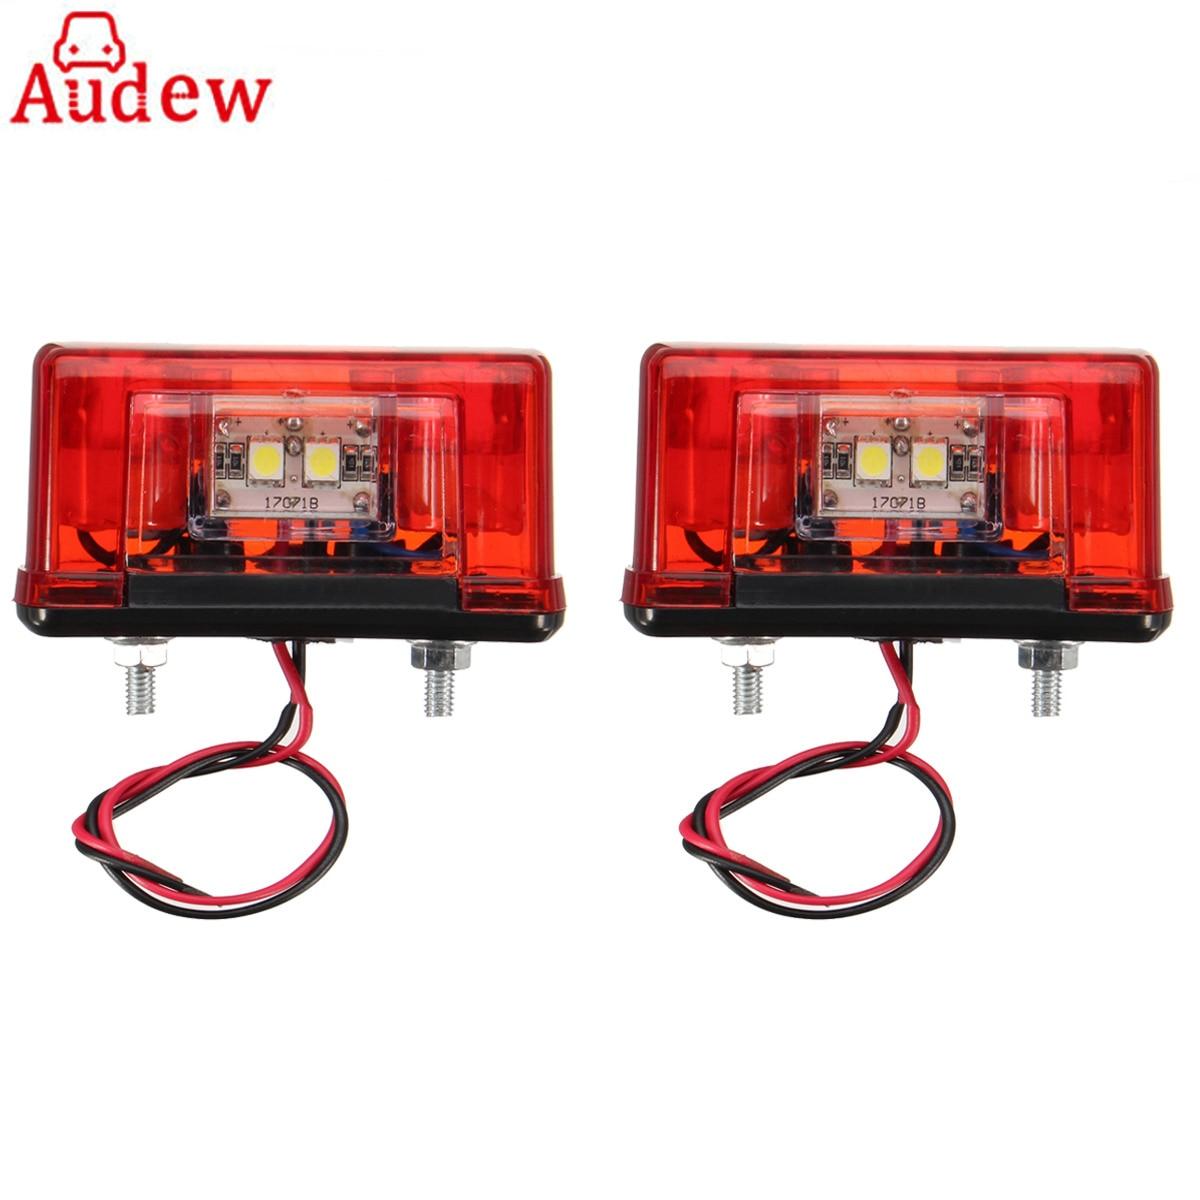 2Pcs 12V / 24V Truck Car 4LED License Plate LED Light Side Light Rear Tail Lamp Waterproof 2pcs truck light 4 leds lamp